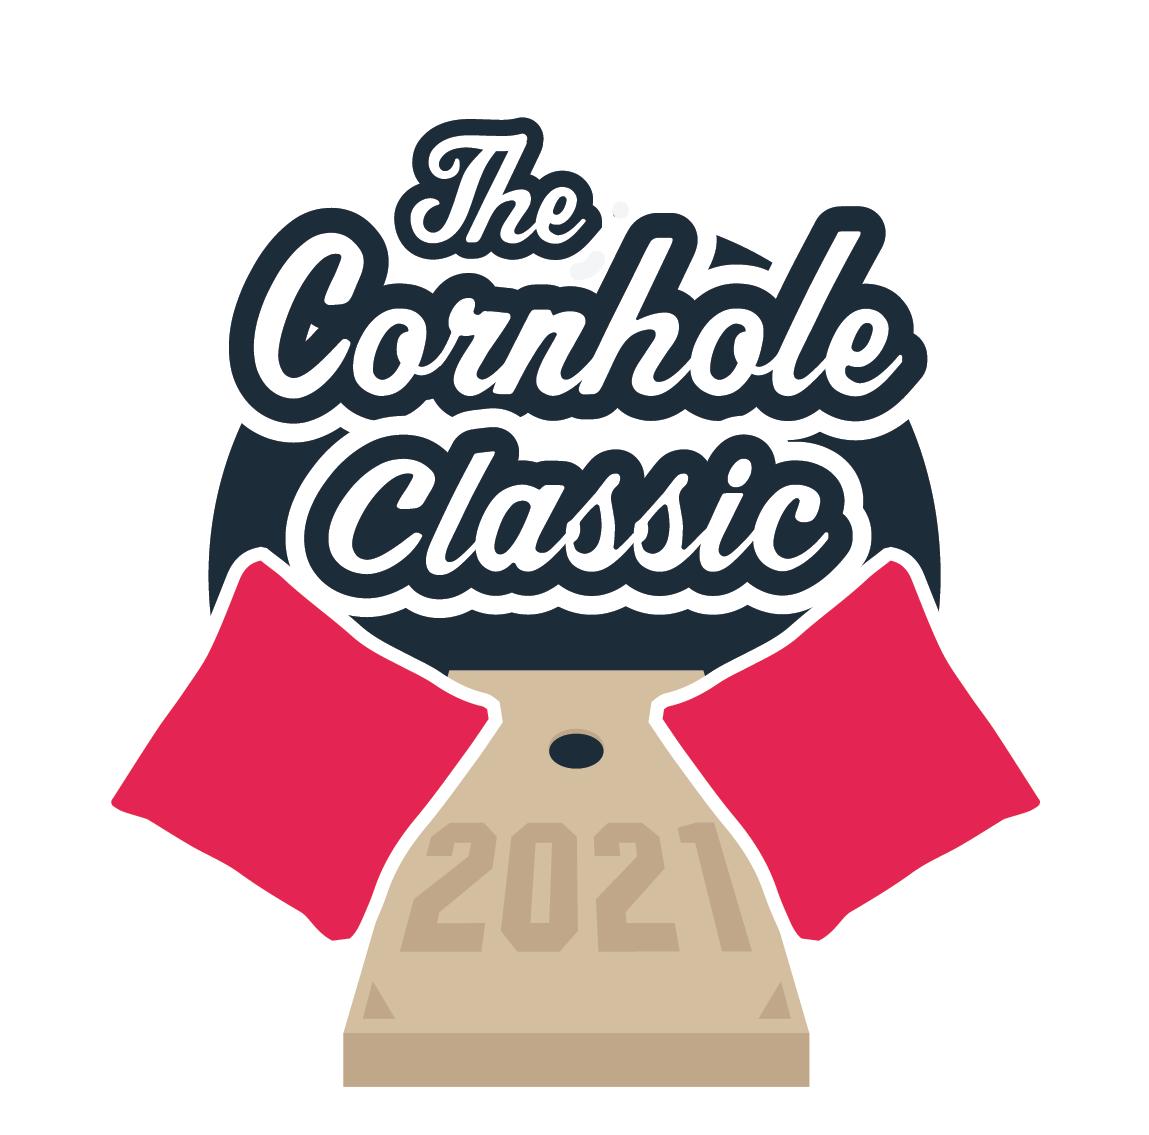 cornhole classic 2021